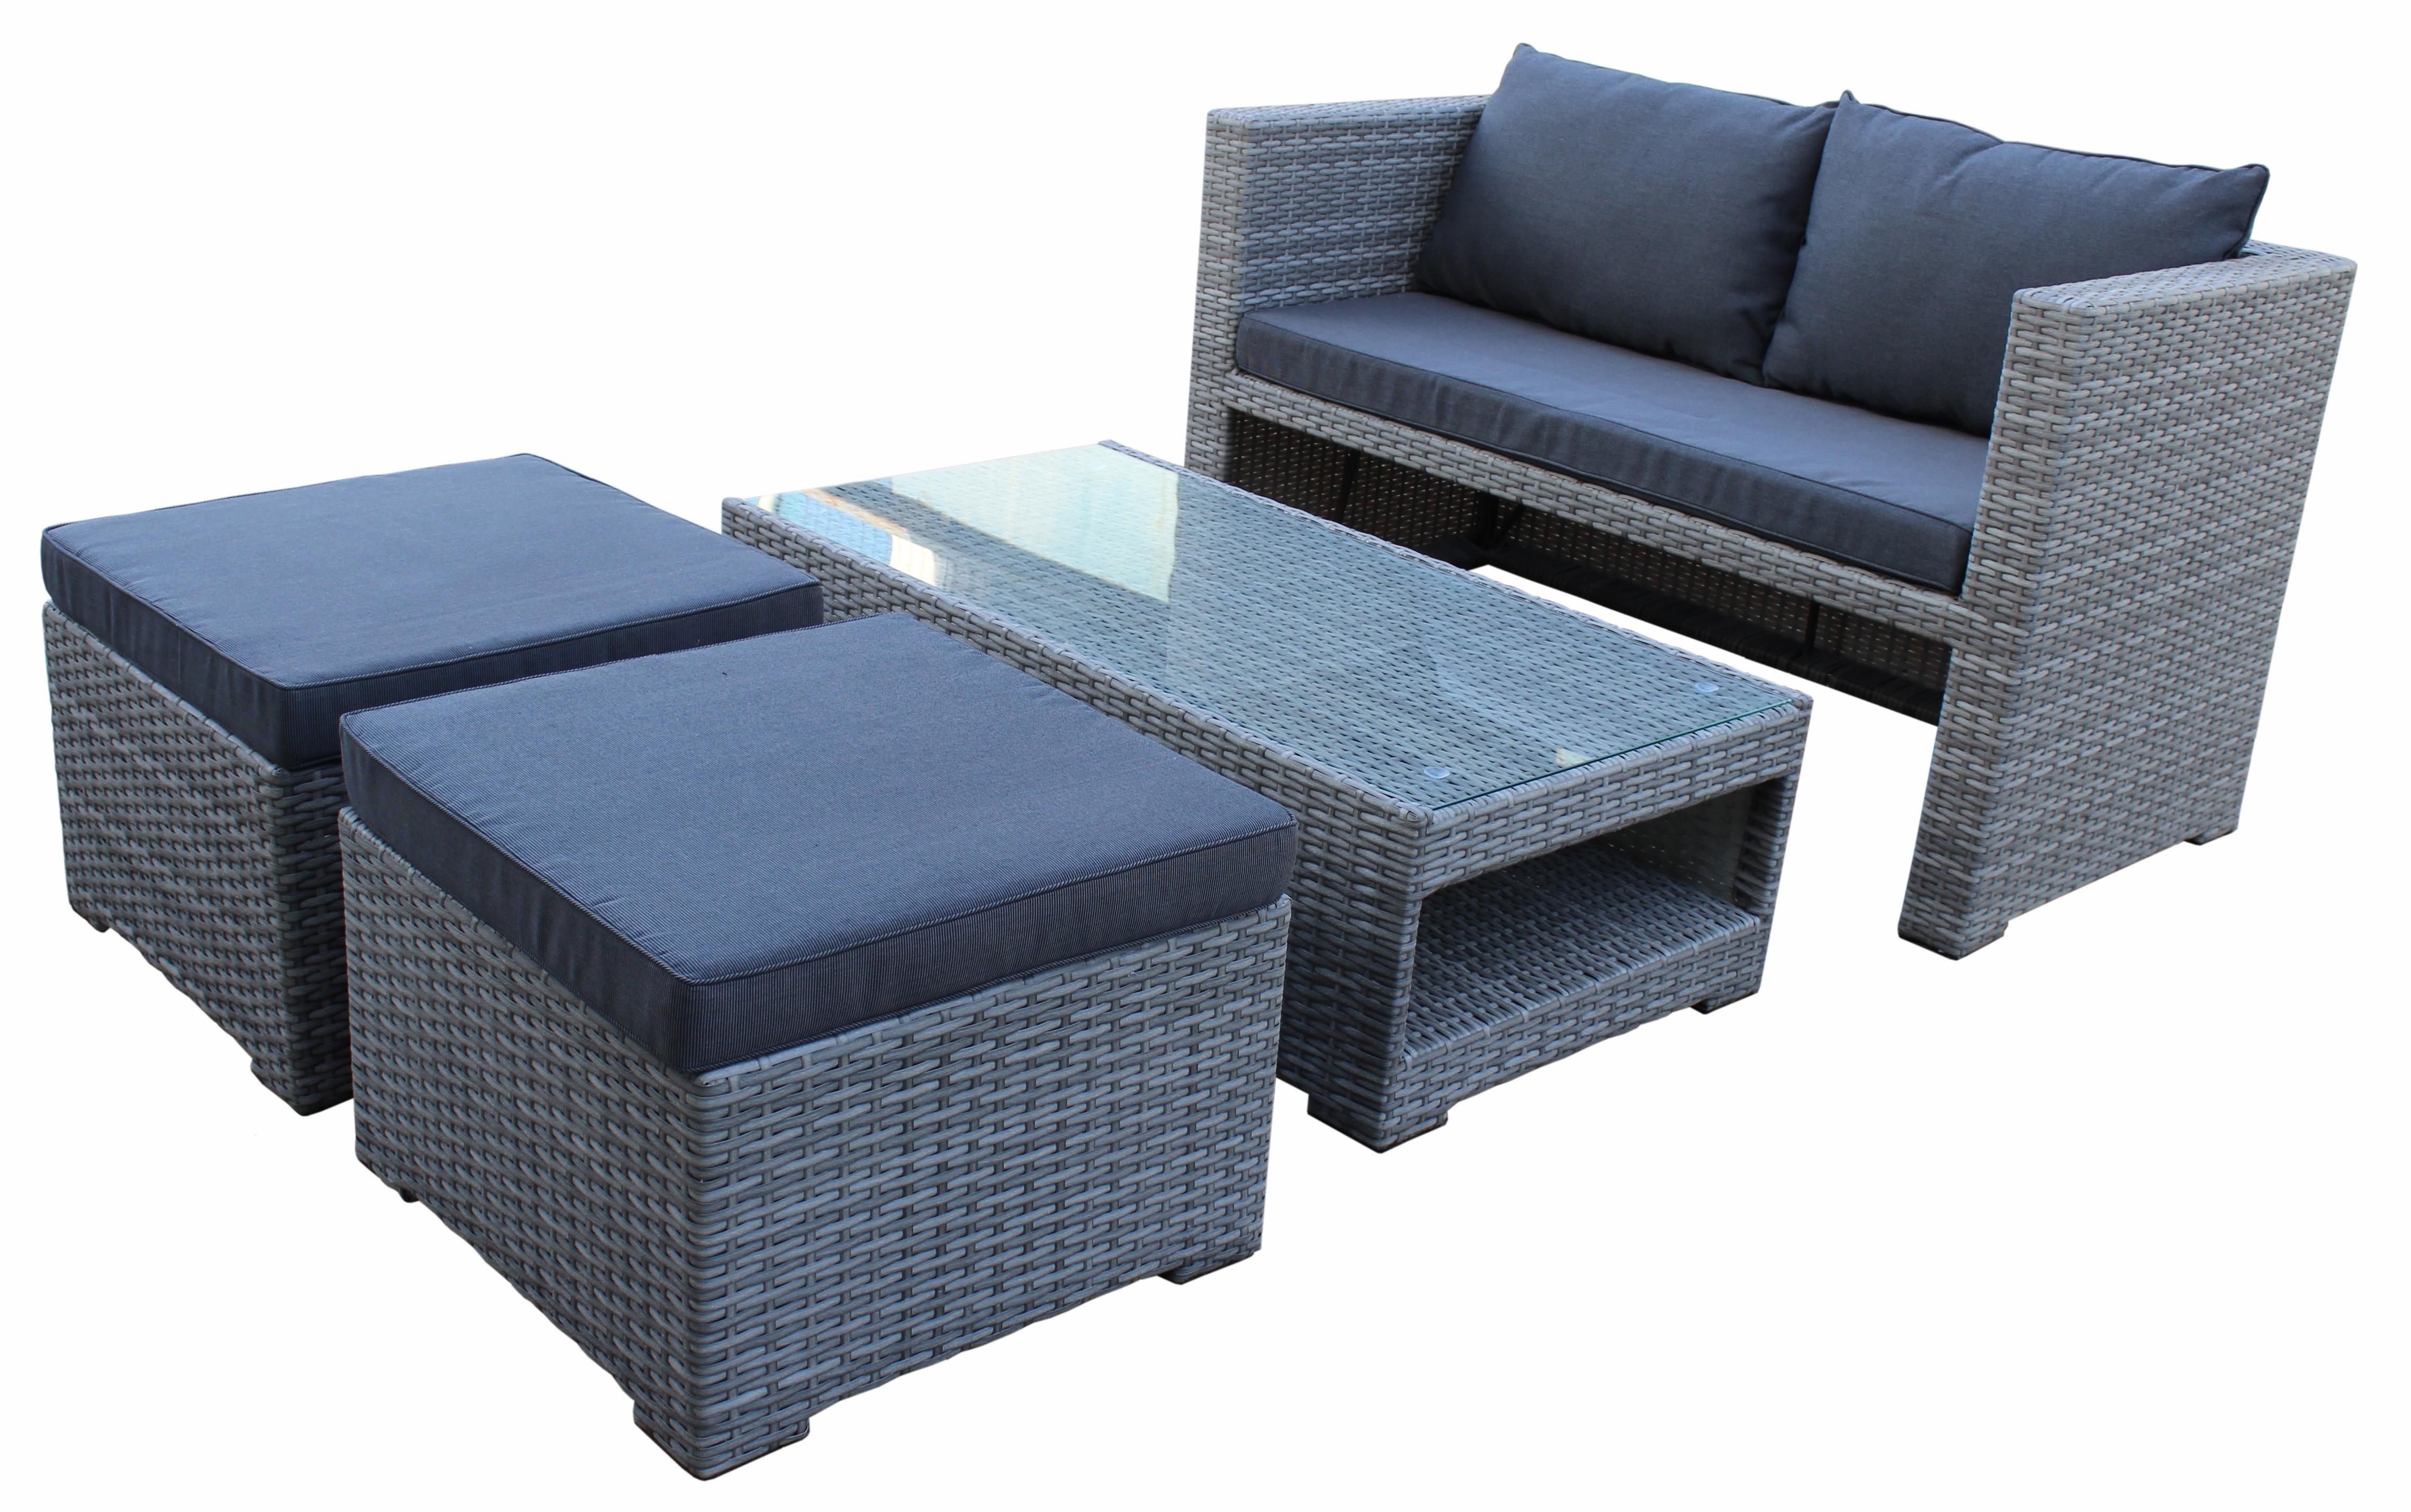 loungeset gartenm bel garnitur rattangarnitur sitzgruppe fiorino grau 2 wahl ebay. Black Bedroom Furniture Sets. Home Design Ideas